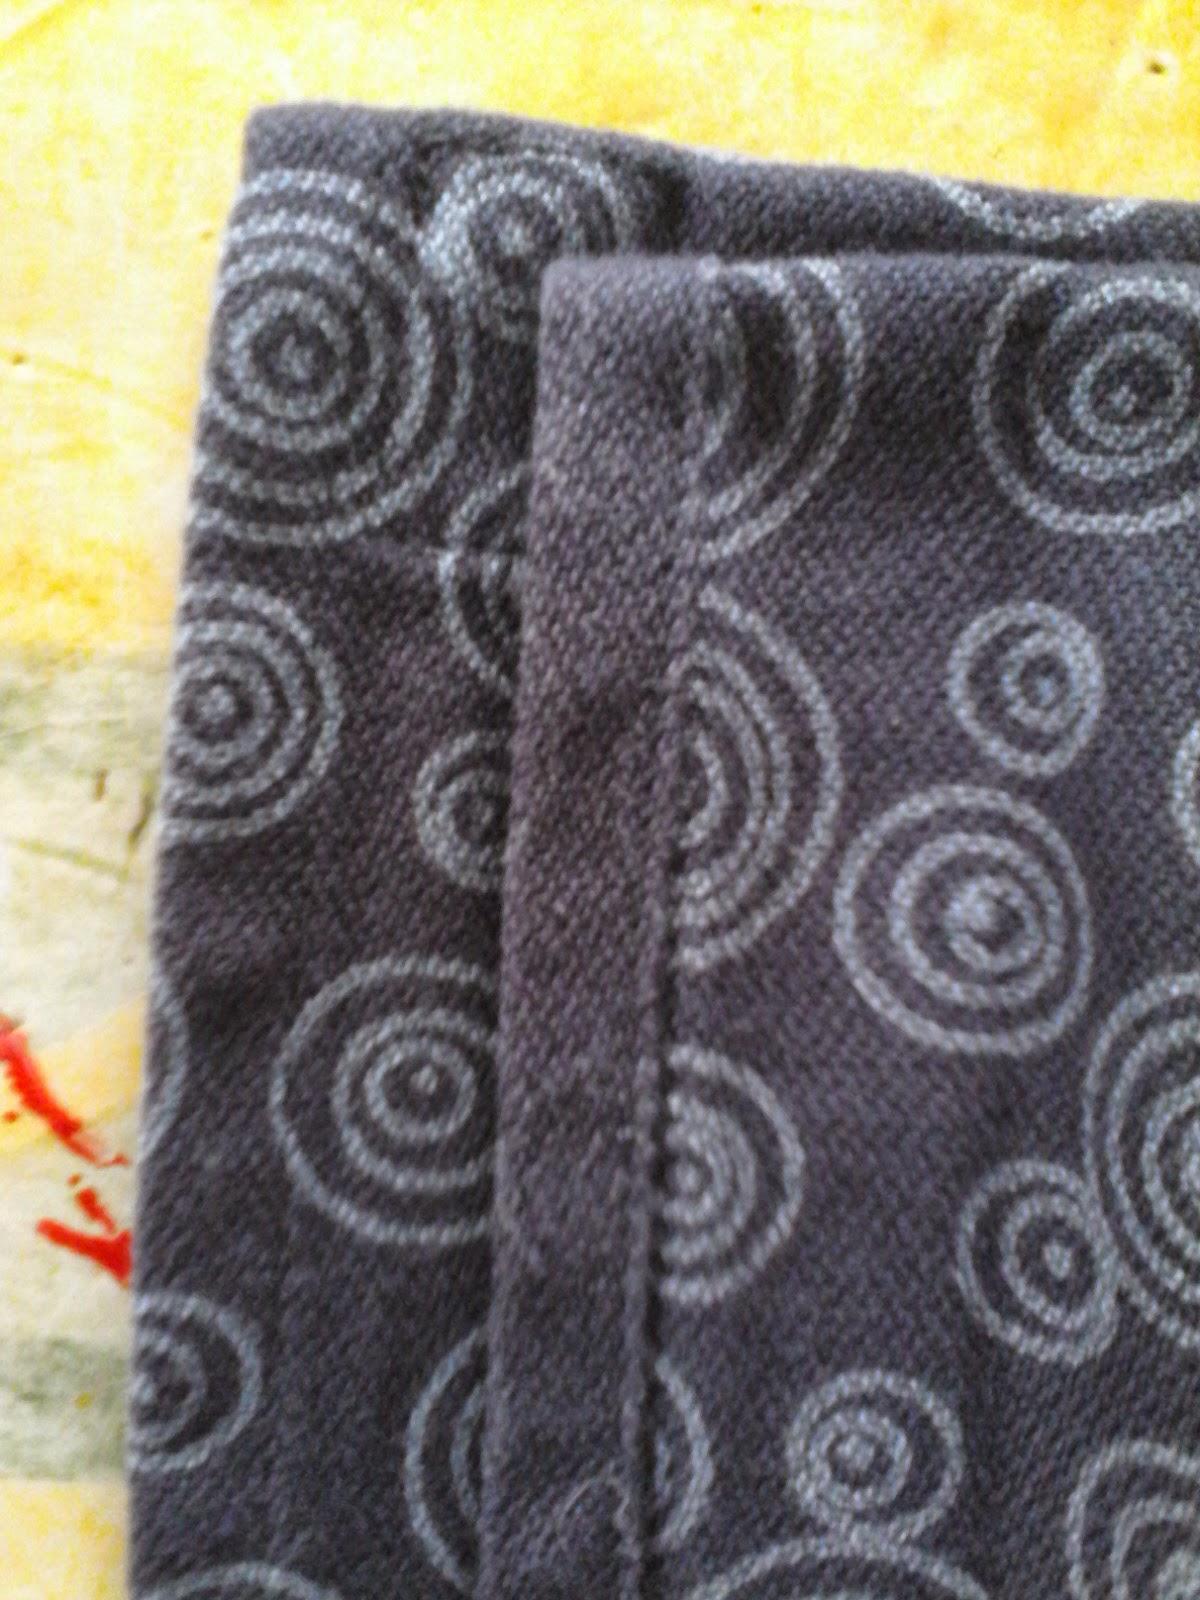 b9e788fcb26c review portage écharpe Lana sergé brisé coton rondo babywearing